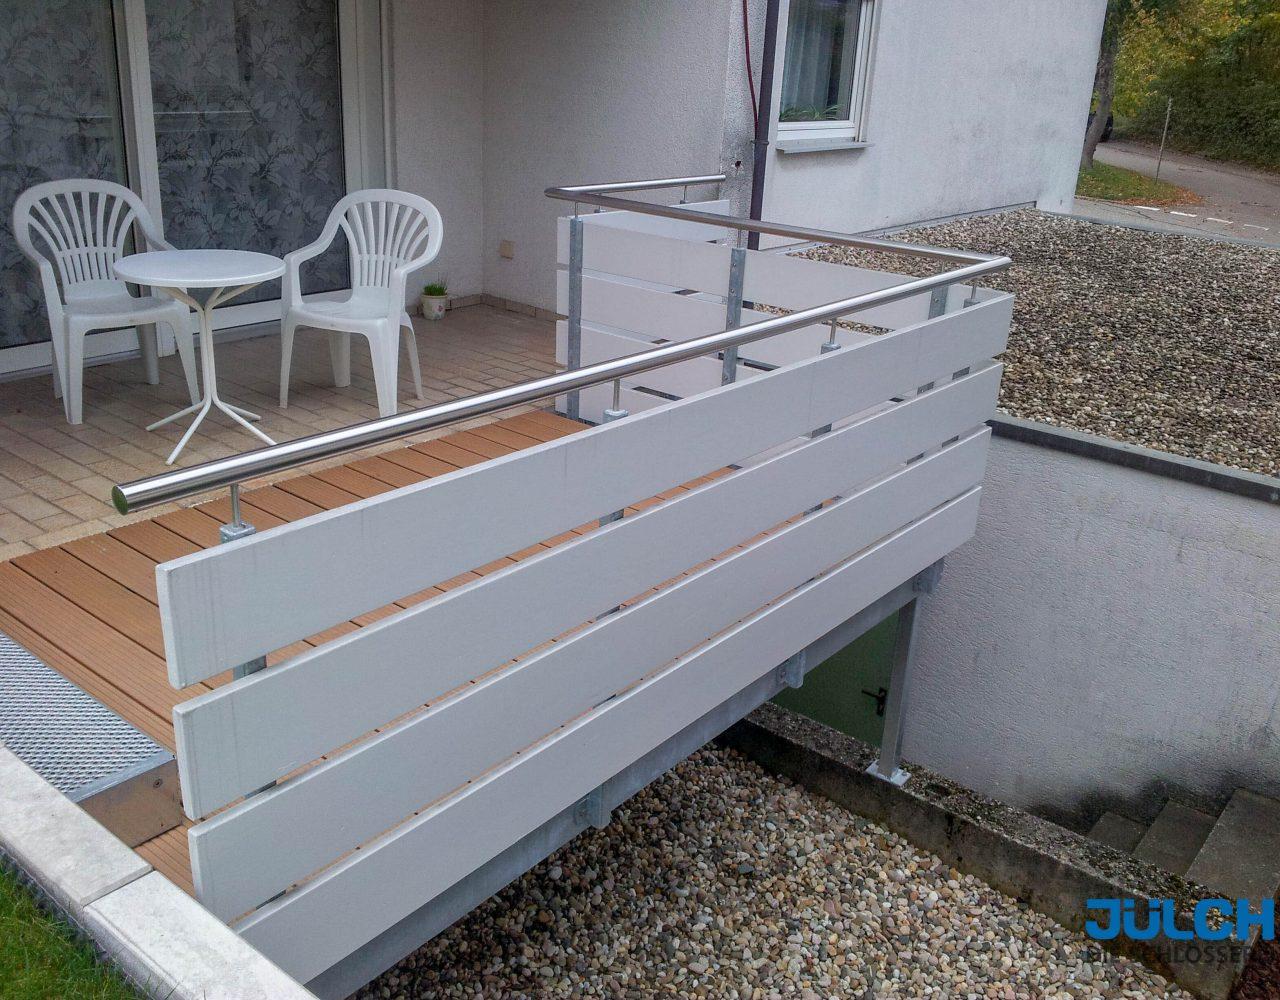 Balkon Gelaender, waagrechtes Holz, Handlauf aus Edelstahl